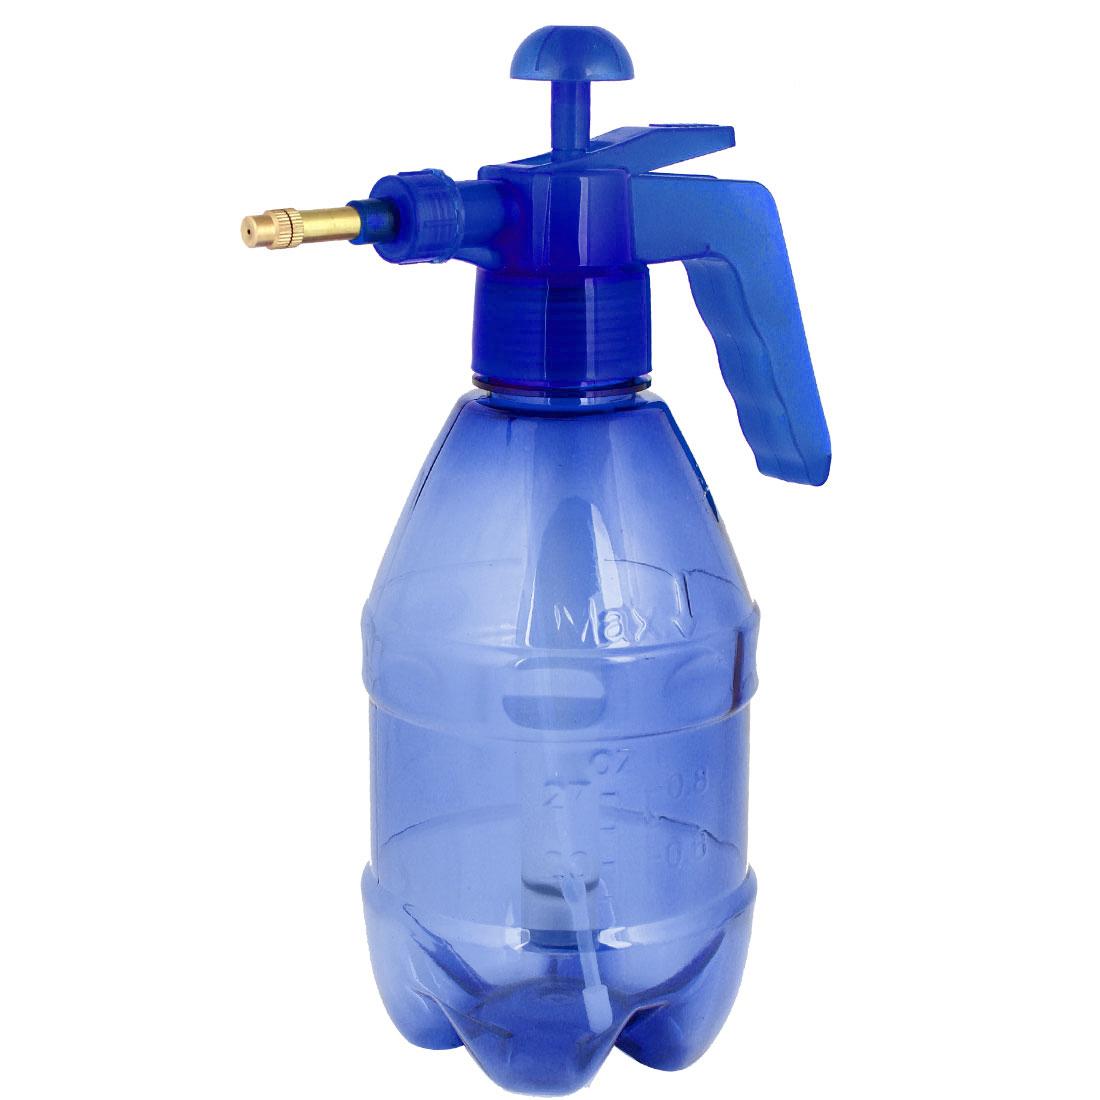 1.5L Pressure Chemical Sprayer Garden Plant Water Spray Bottle Clear Blue